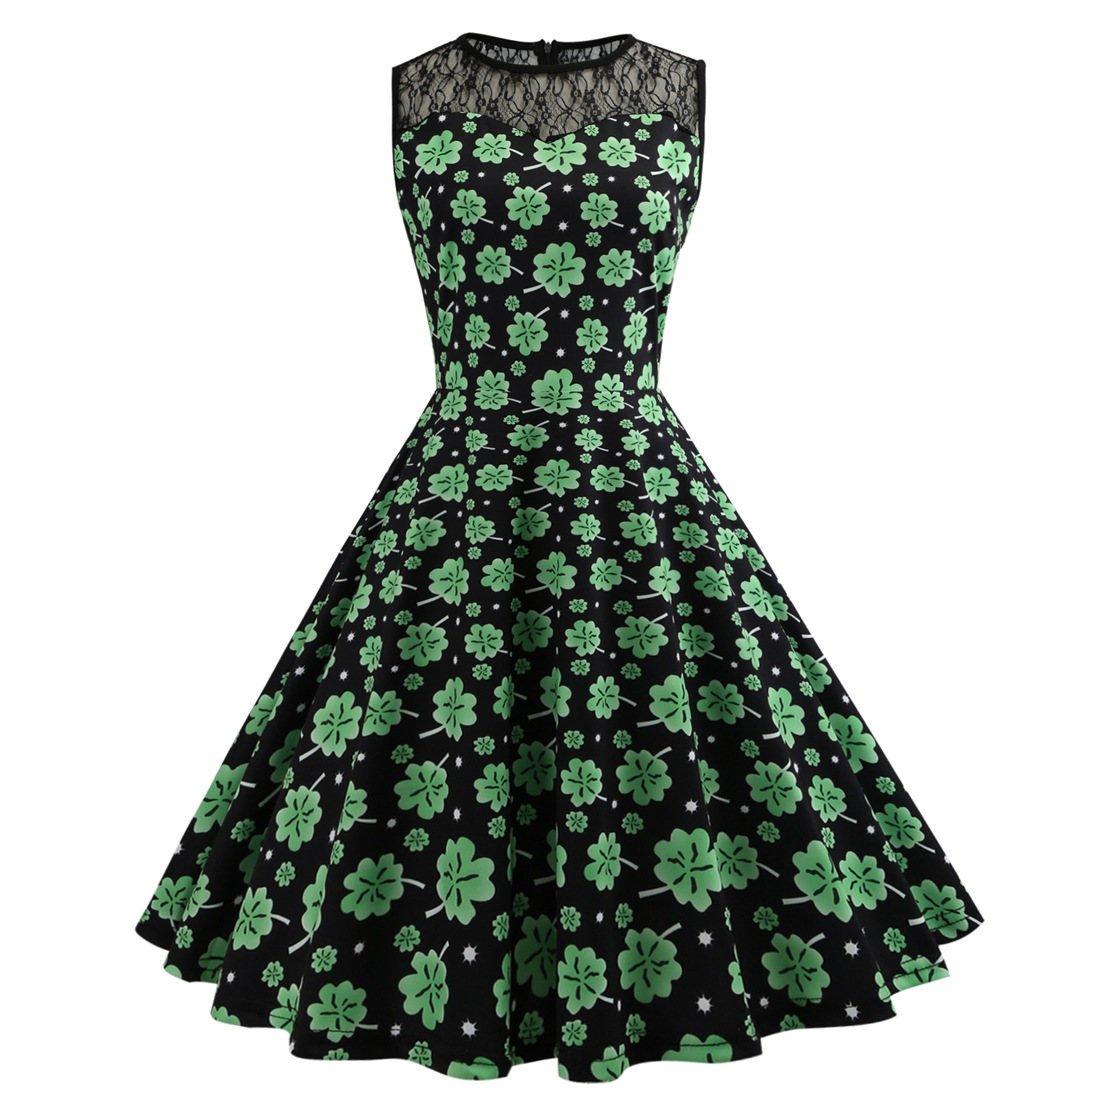 Shamrocks Printed Retro Party Dresses St. Patrick's Day Casual Dress Fashion Wear